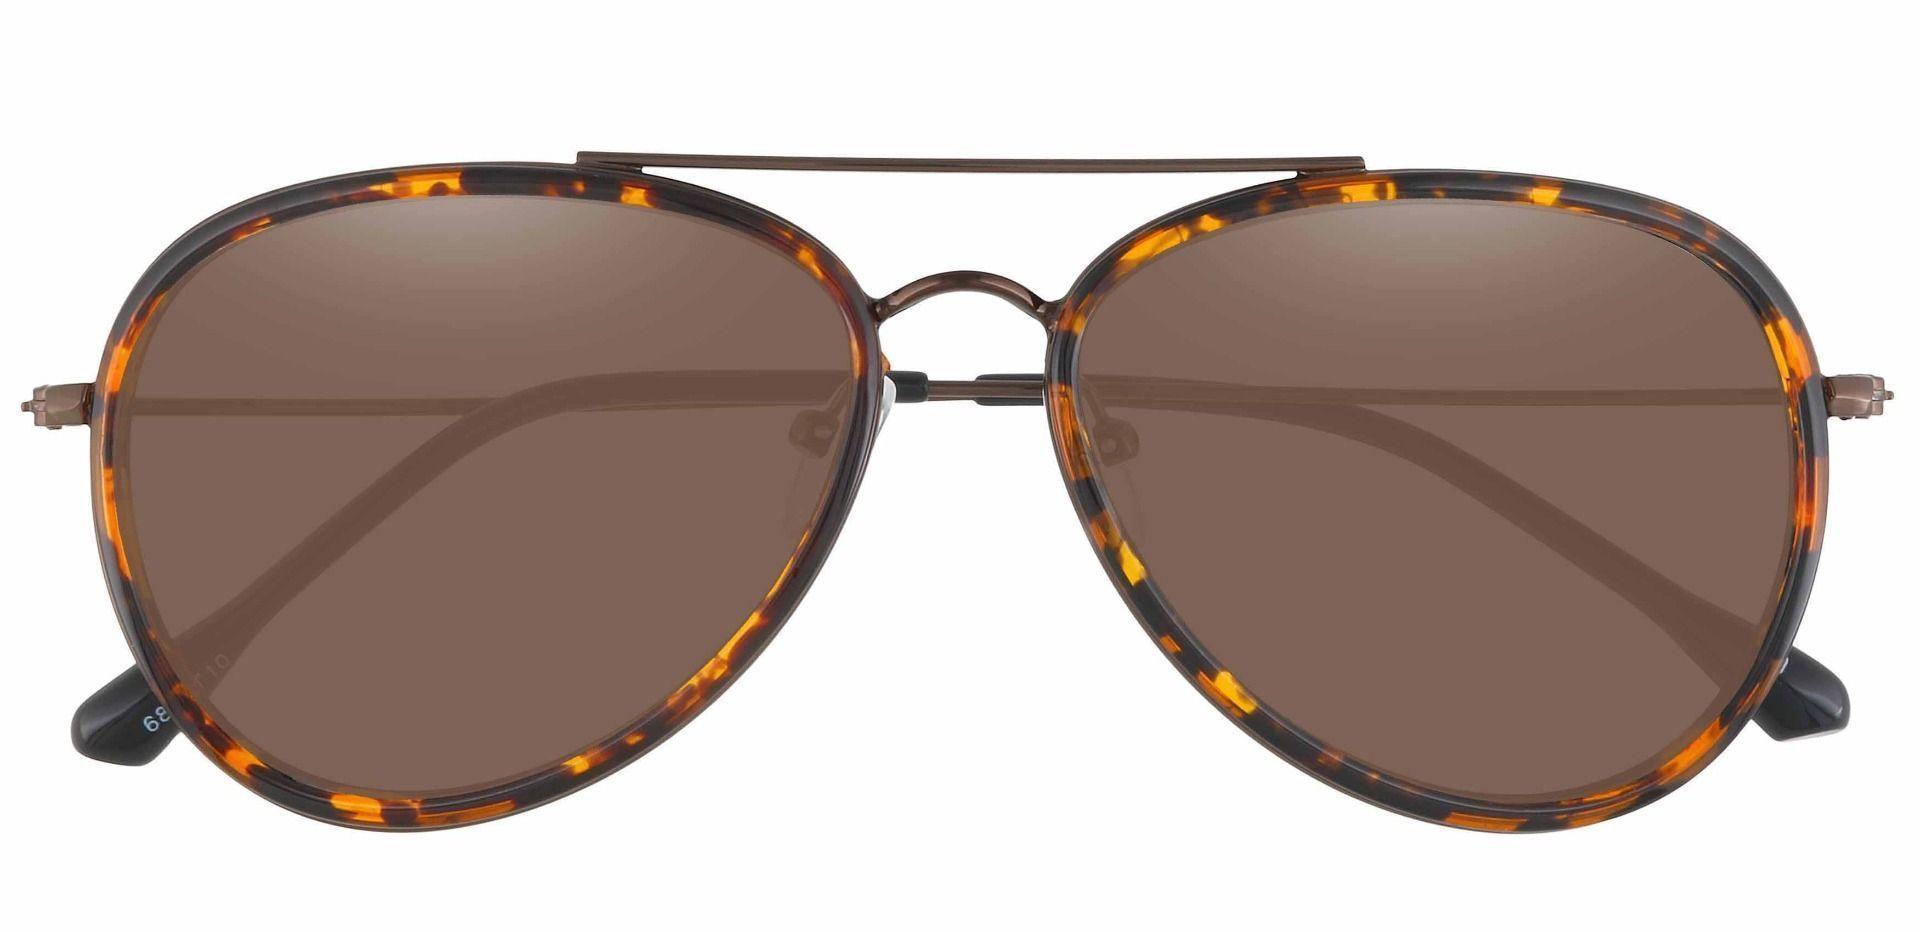 The King Aviator Single Vision Sunglasses - Tortoise Frame With Brown Lenses